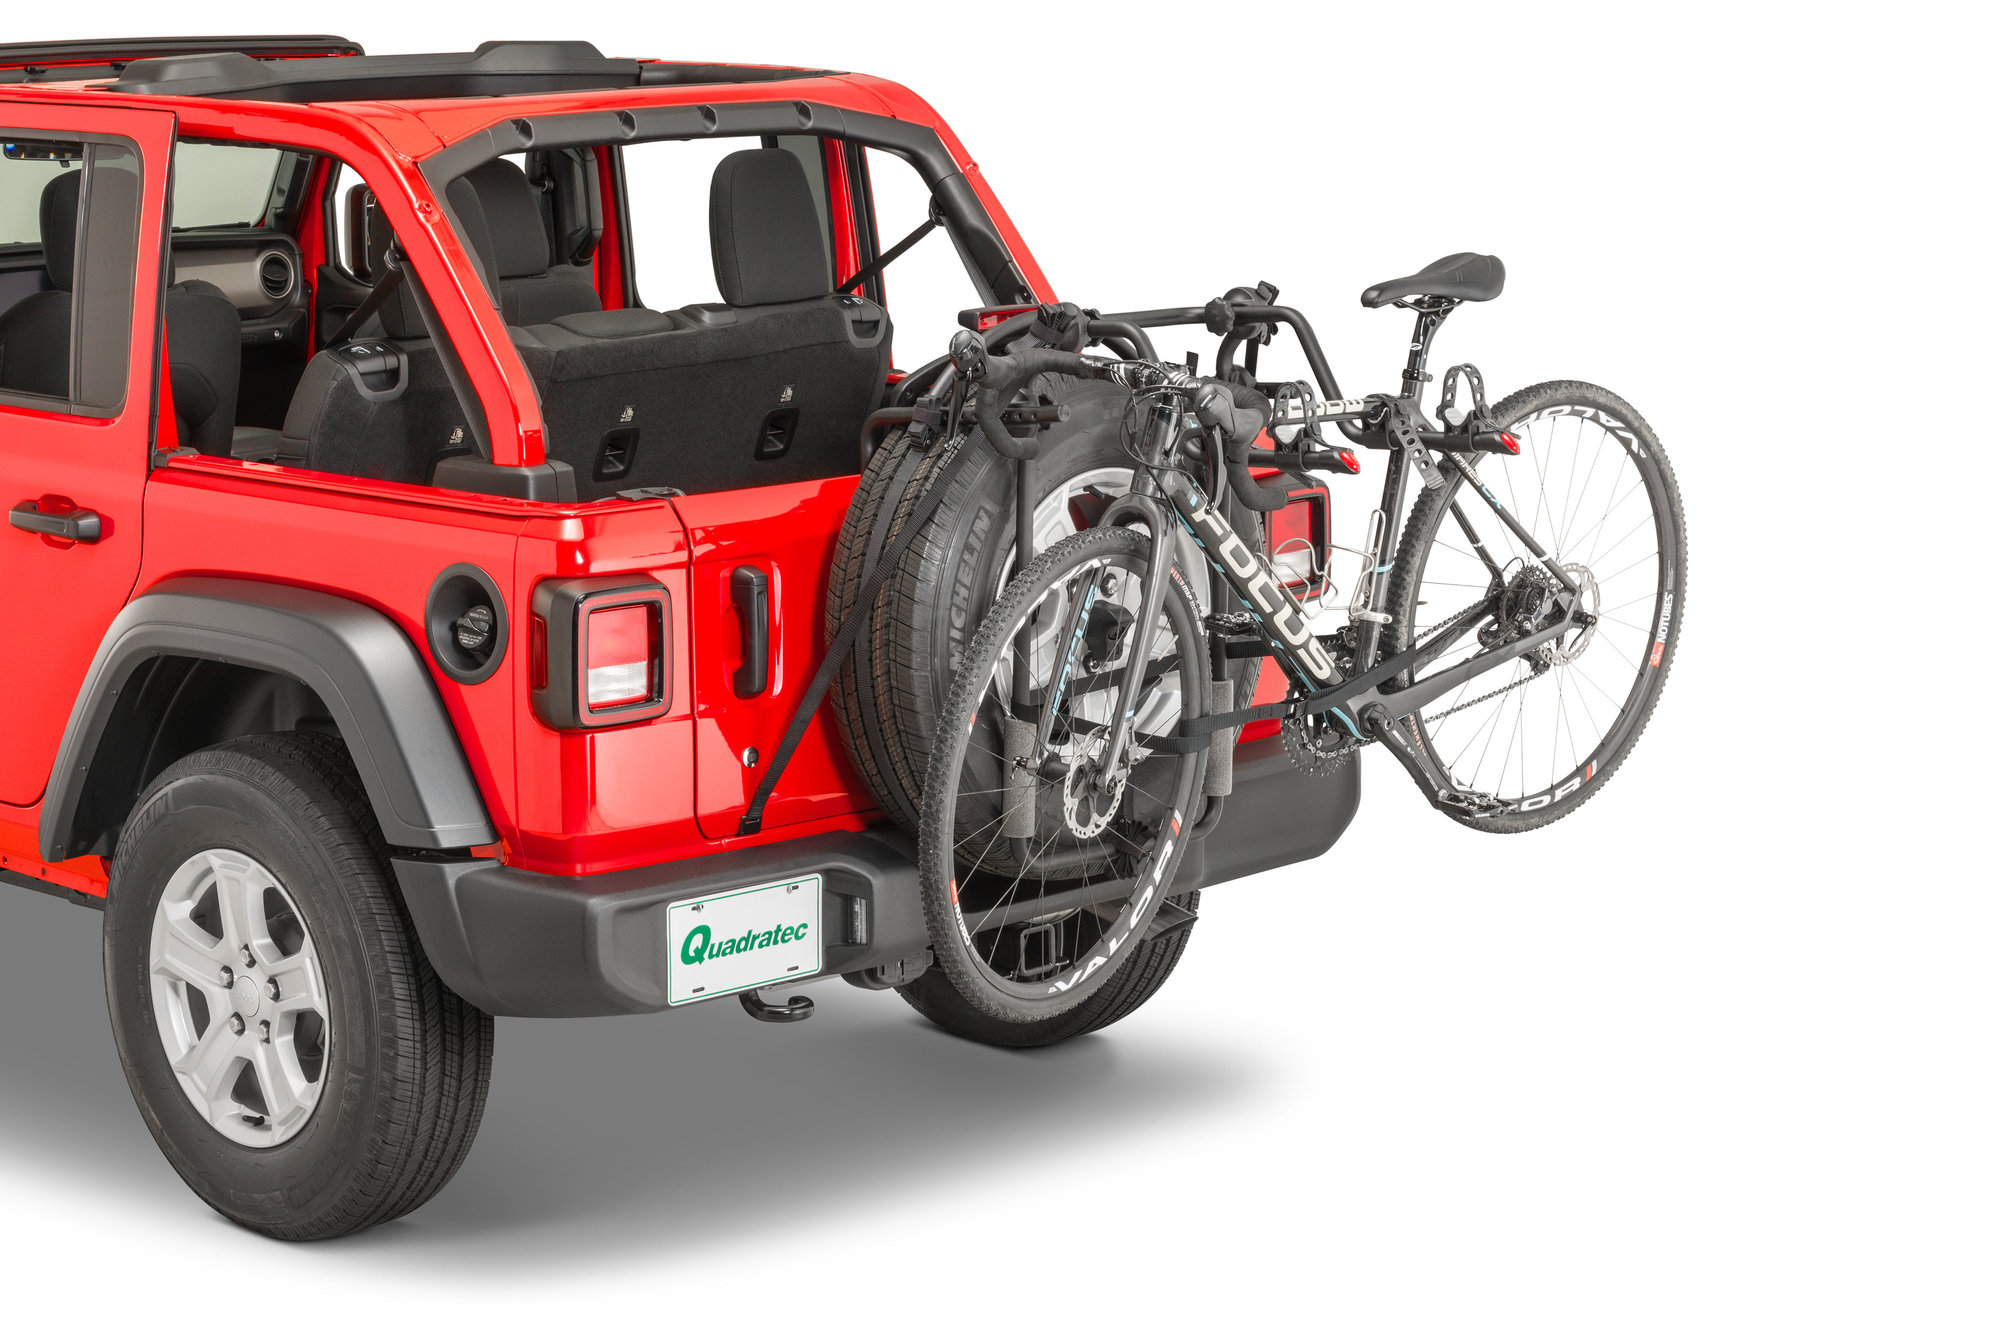 quadratec spare tire mount 2 bike rack